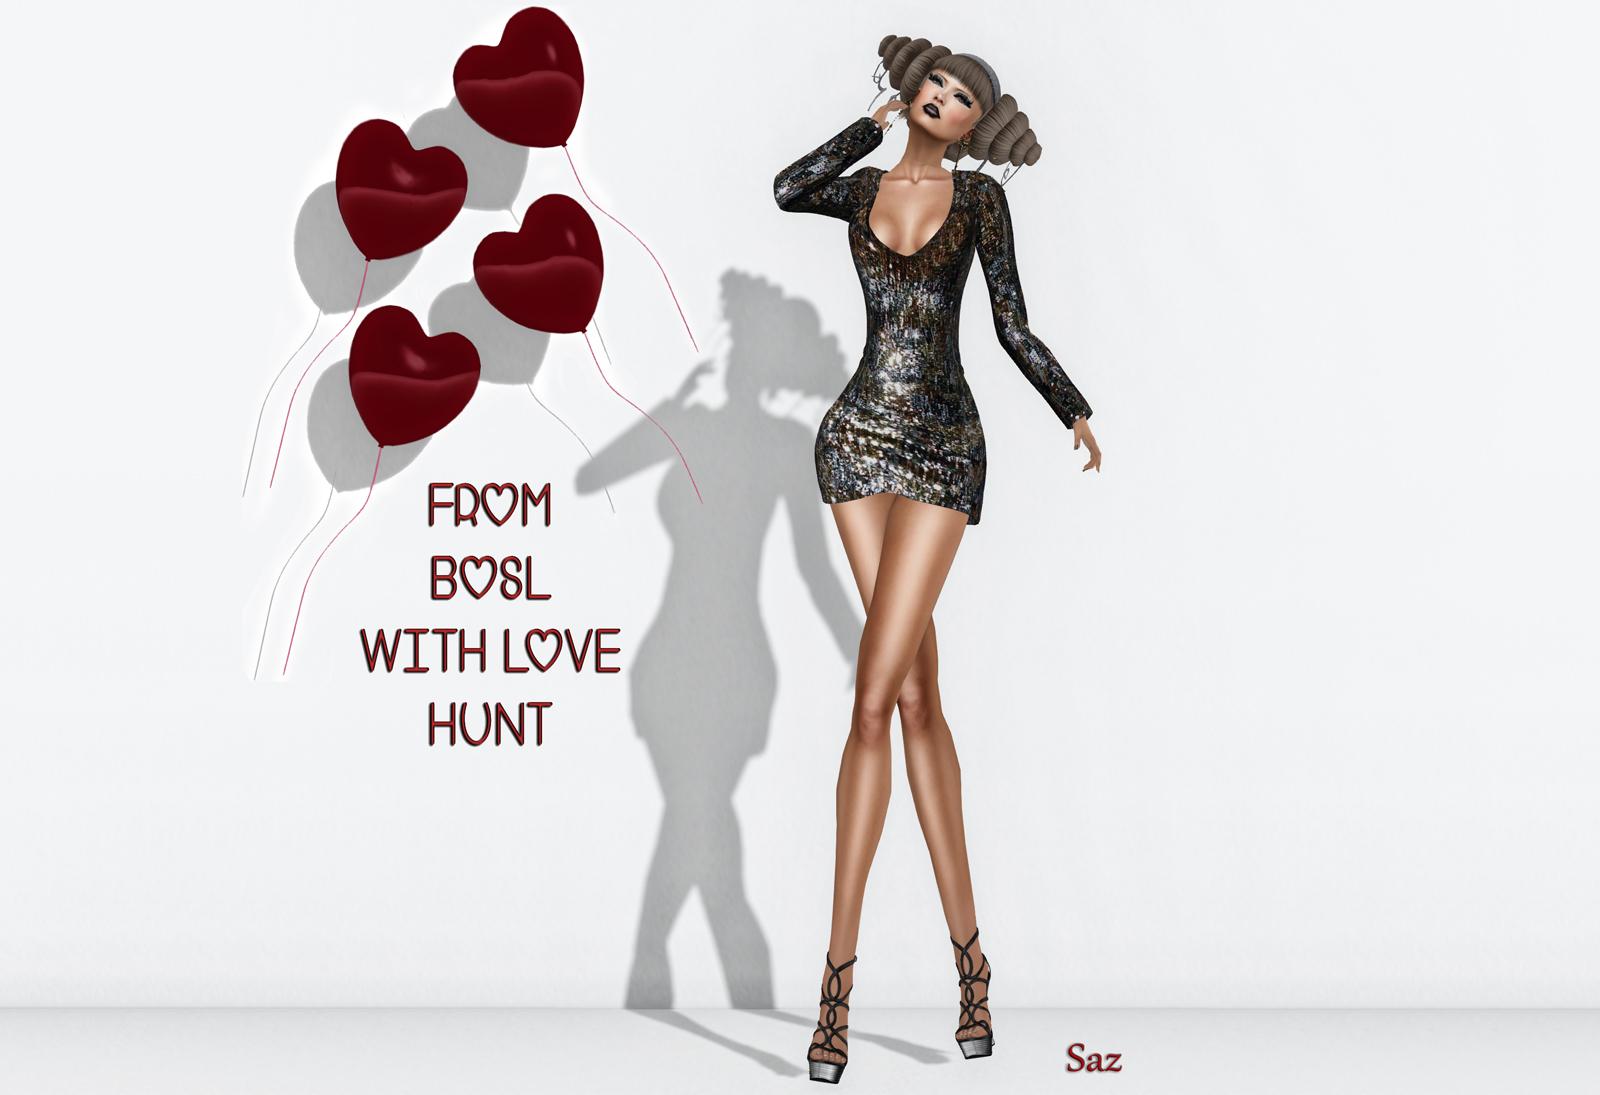 From BoSL with love Violator, Topazia, Countdown